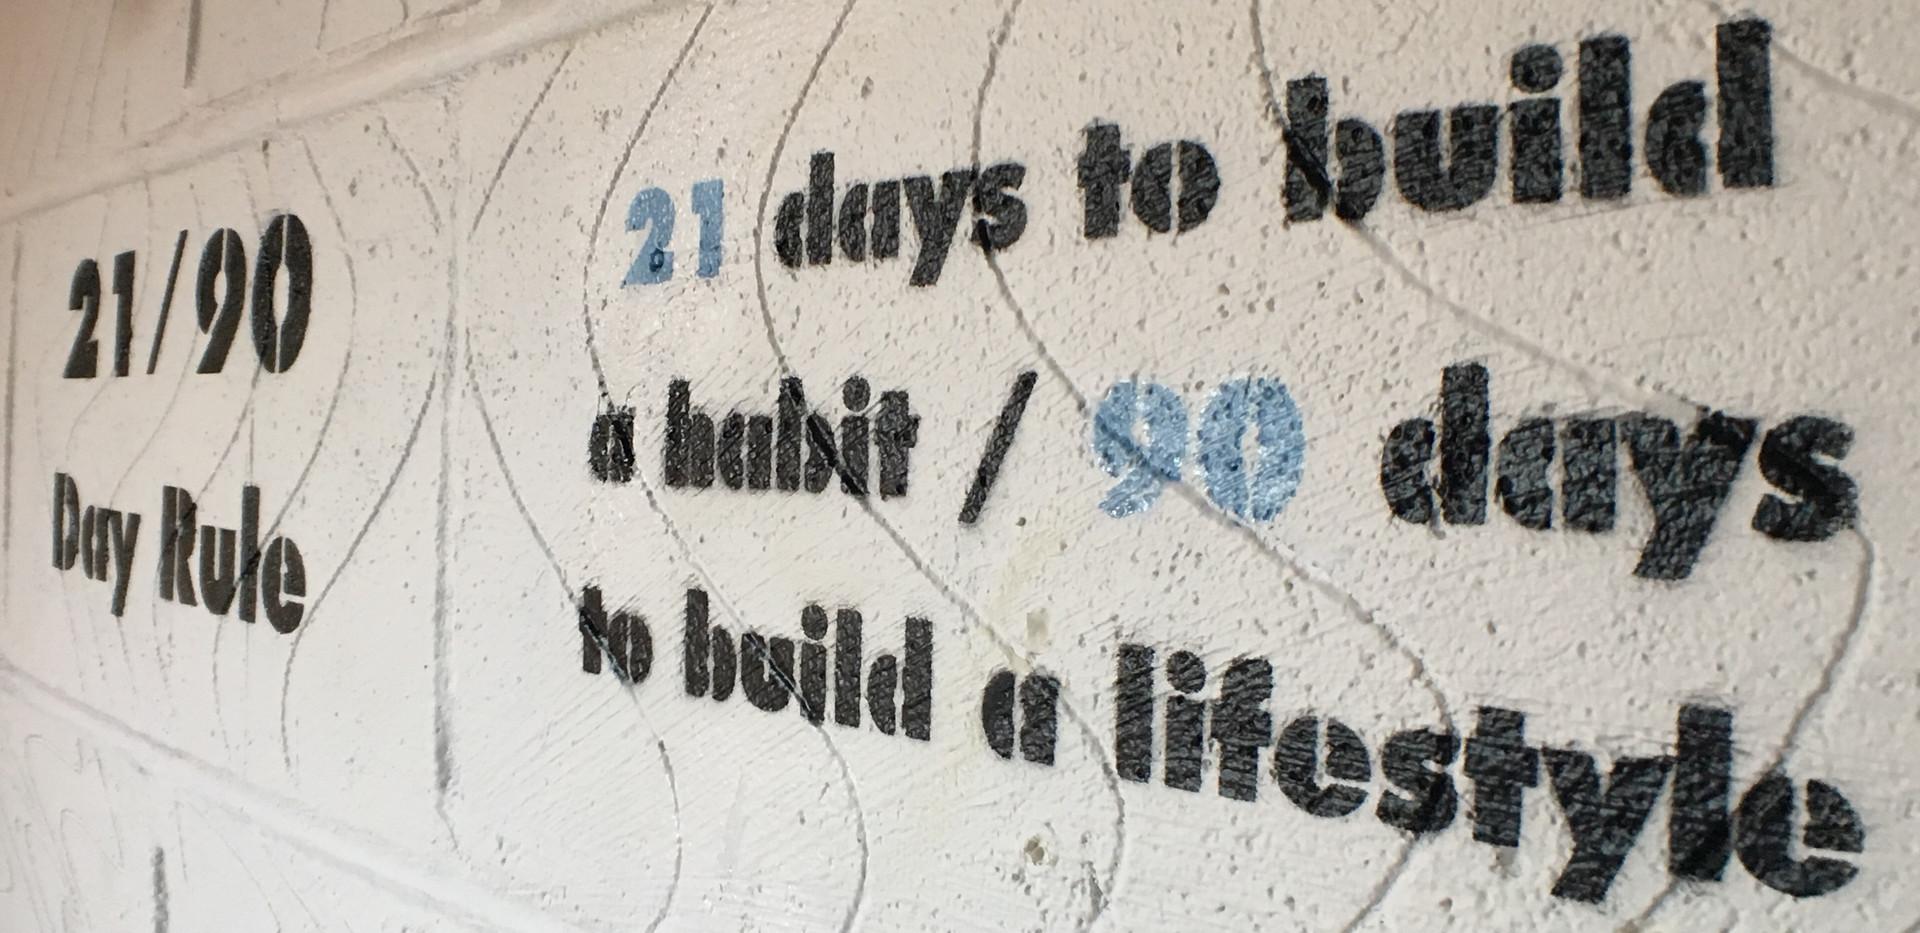 21/90 day rule...